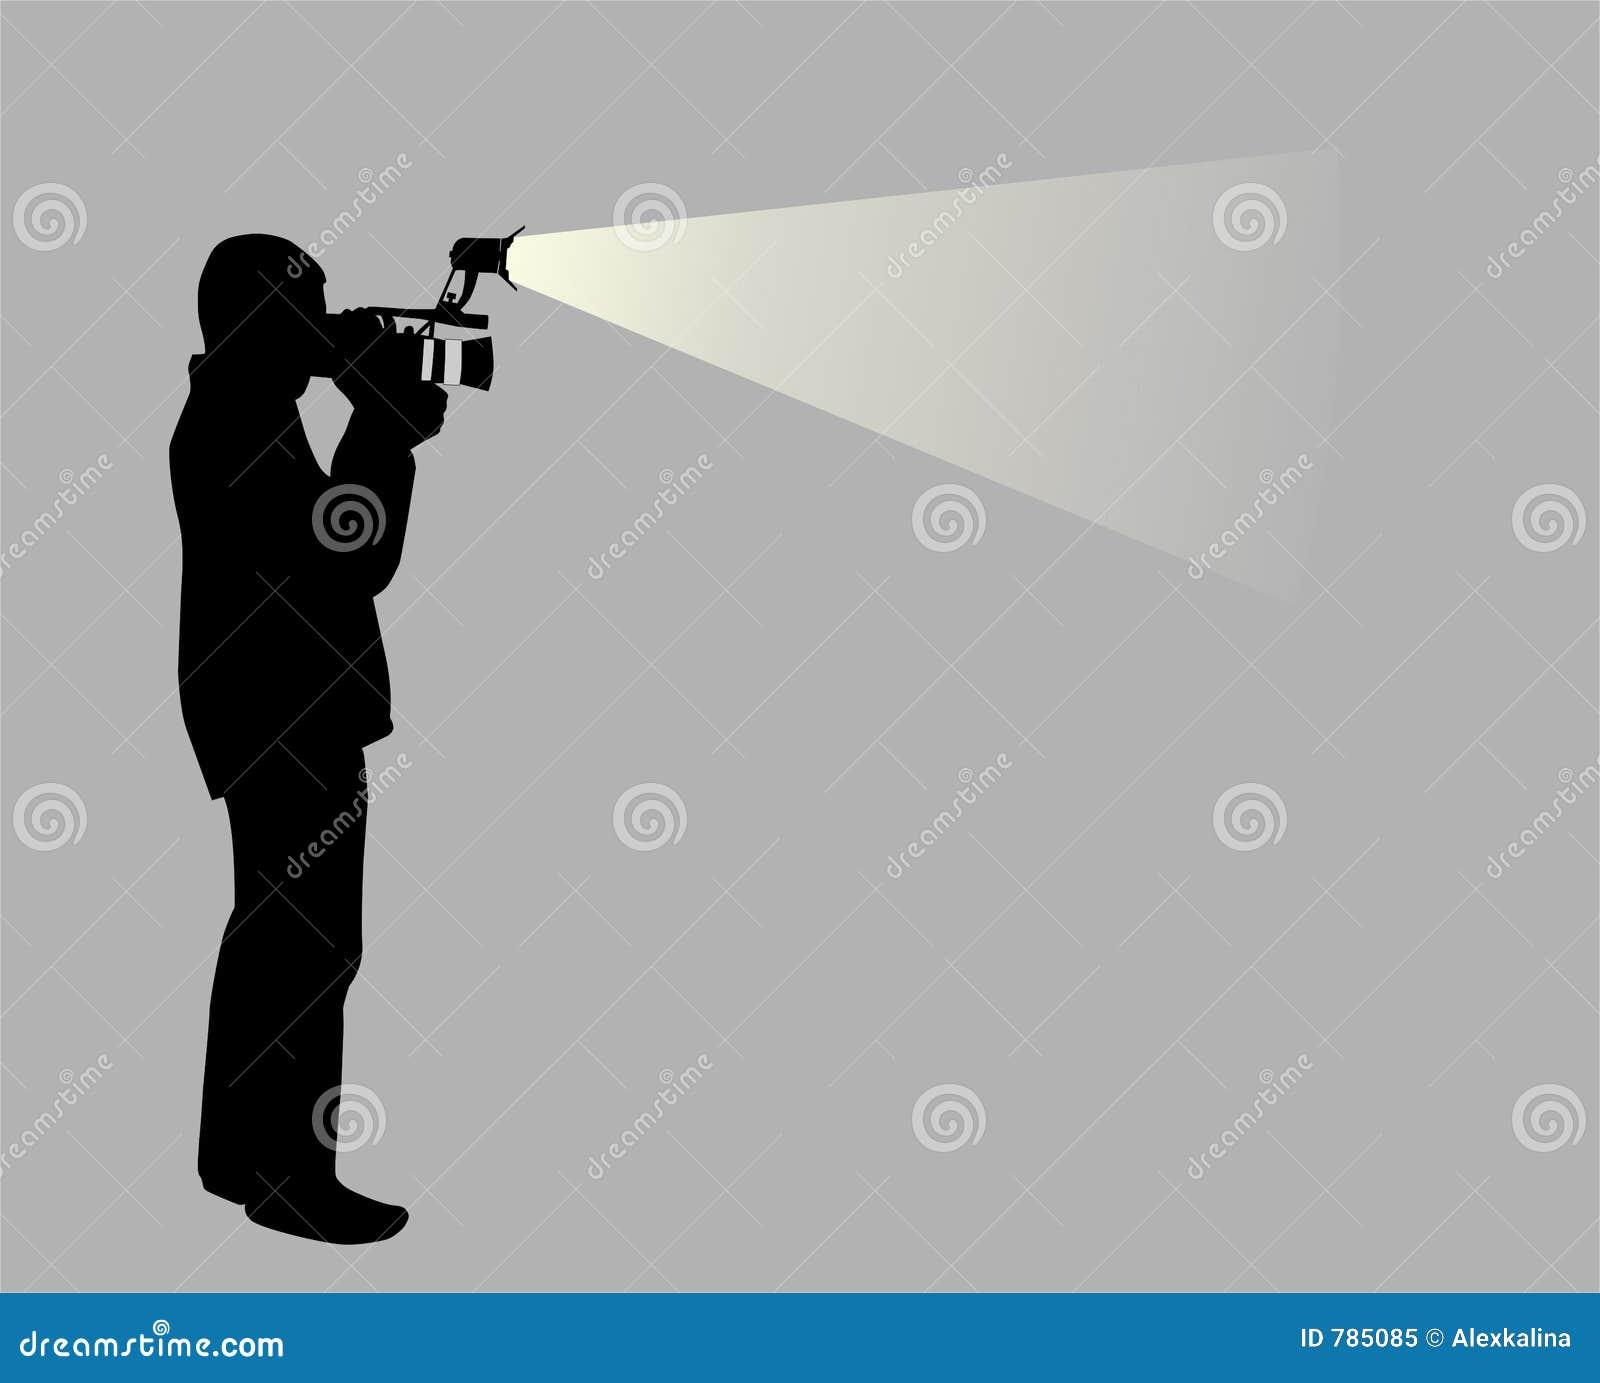 Wideo operatora